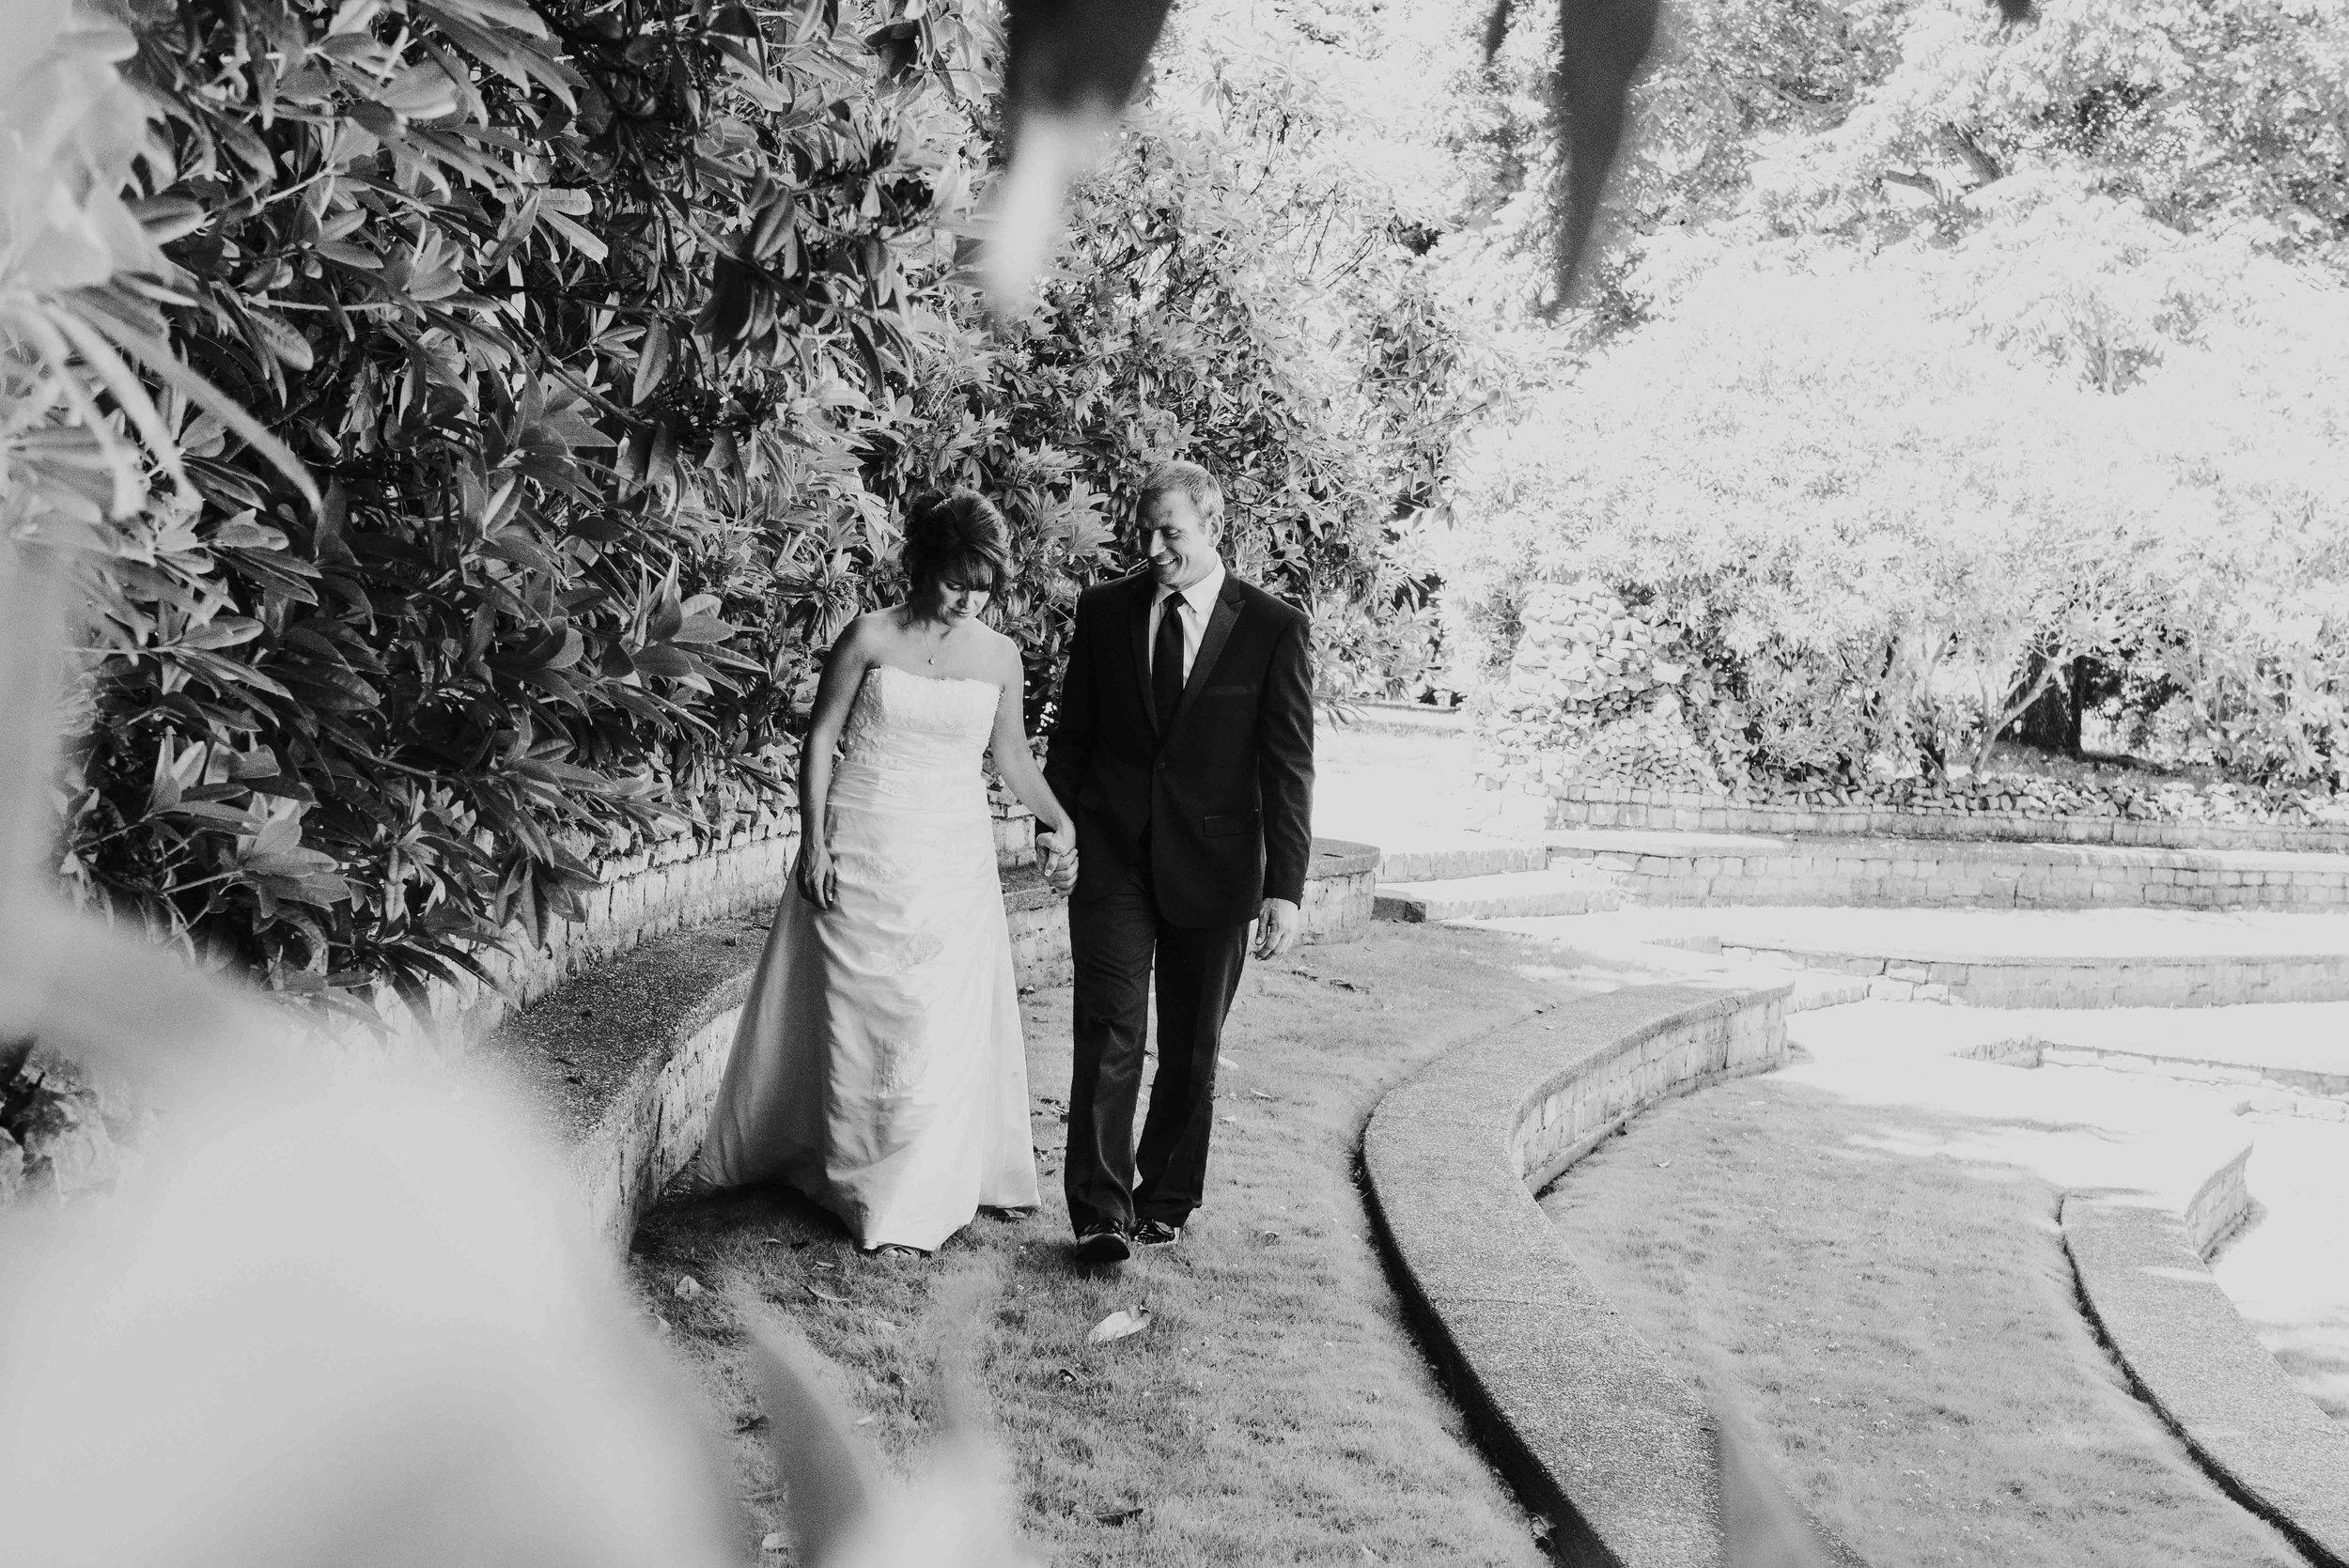 Cap-Sante-Wedding-J-Hodges-Anacortes-11.jpg